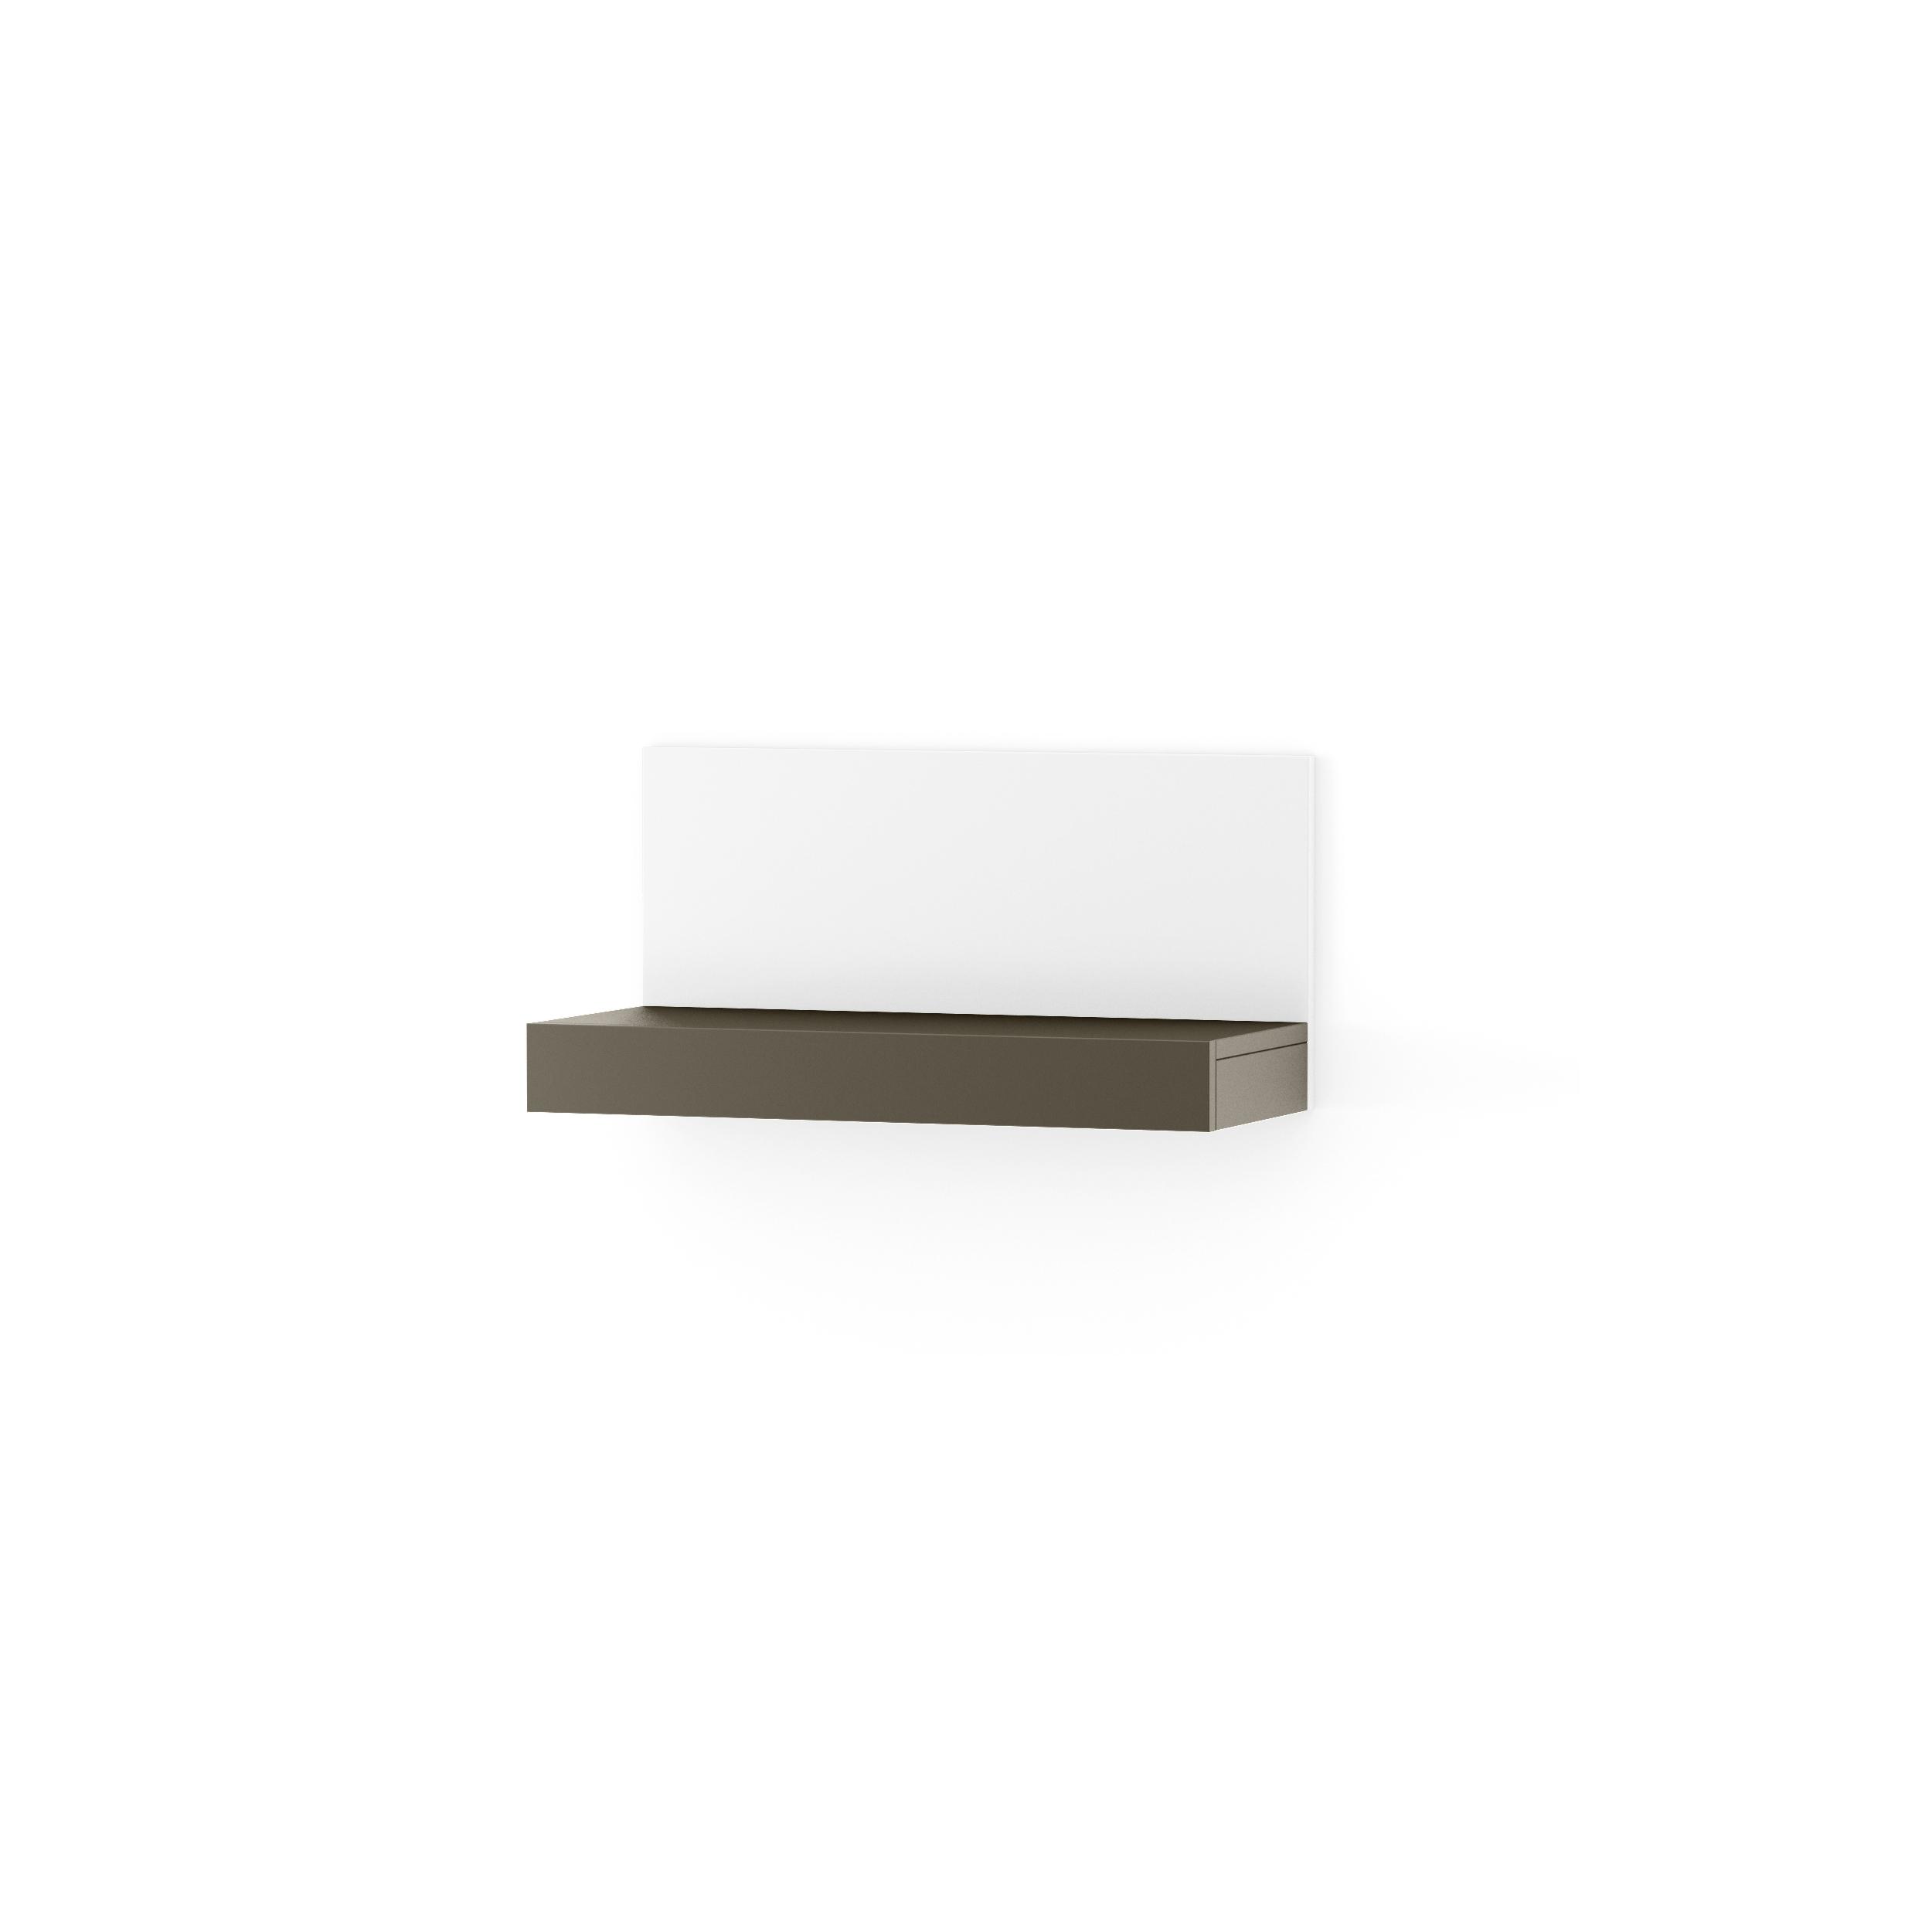 Etajera Nook Middle Graphite/white  L65xl29xh32 Cm